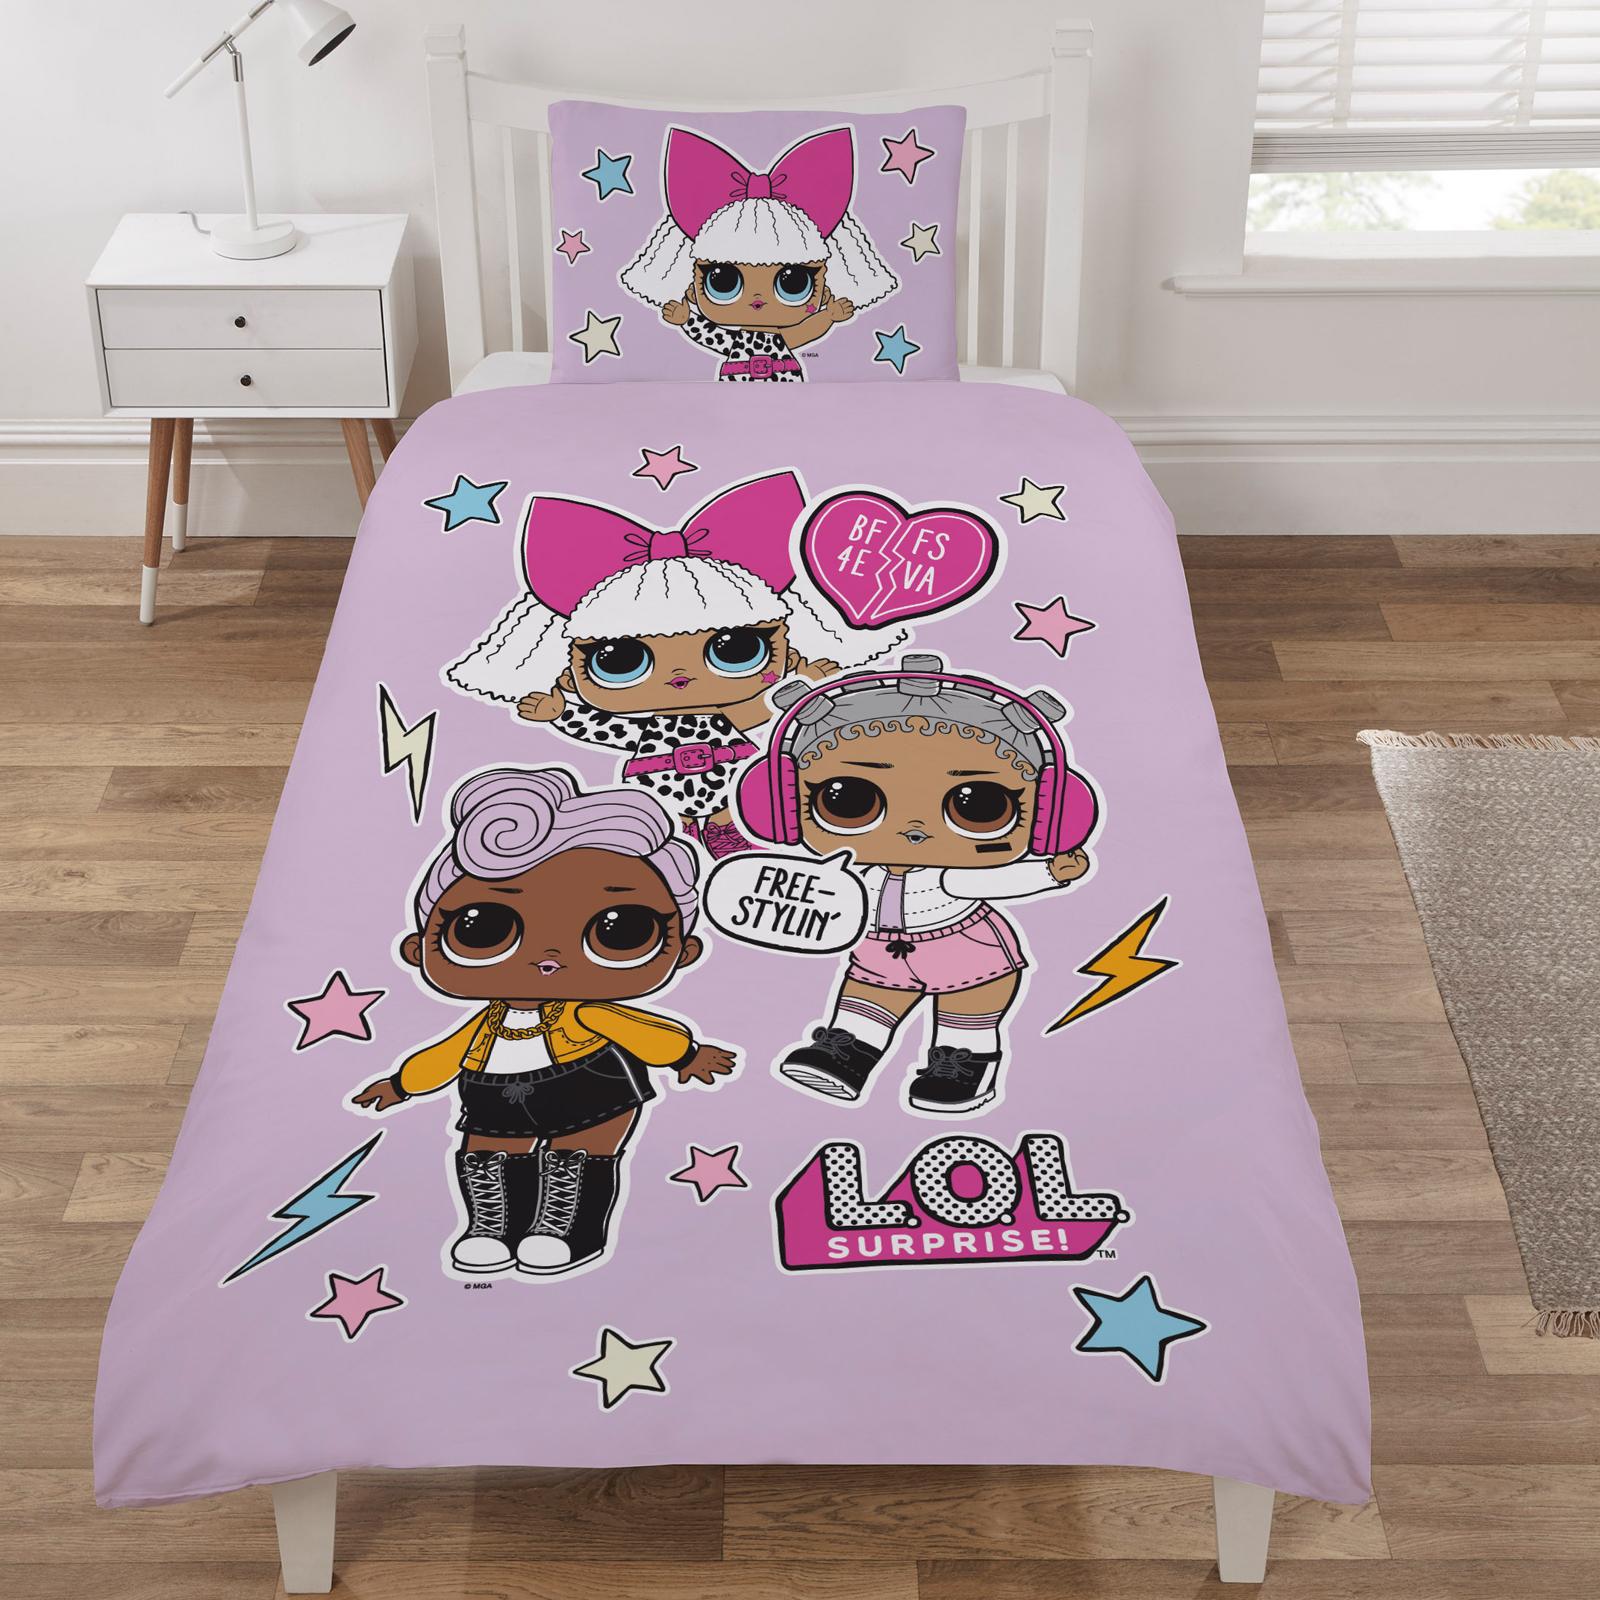 Buy LOL Surprise Bedding Set Single